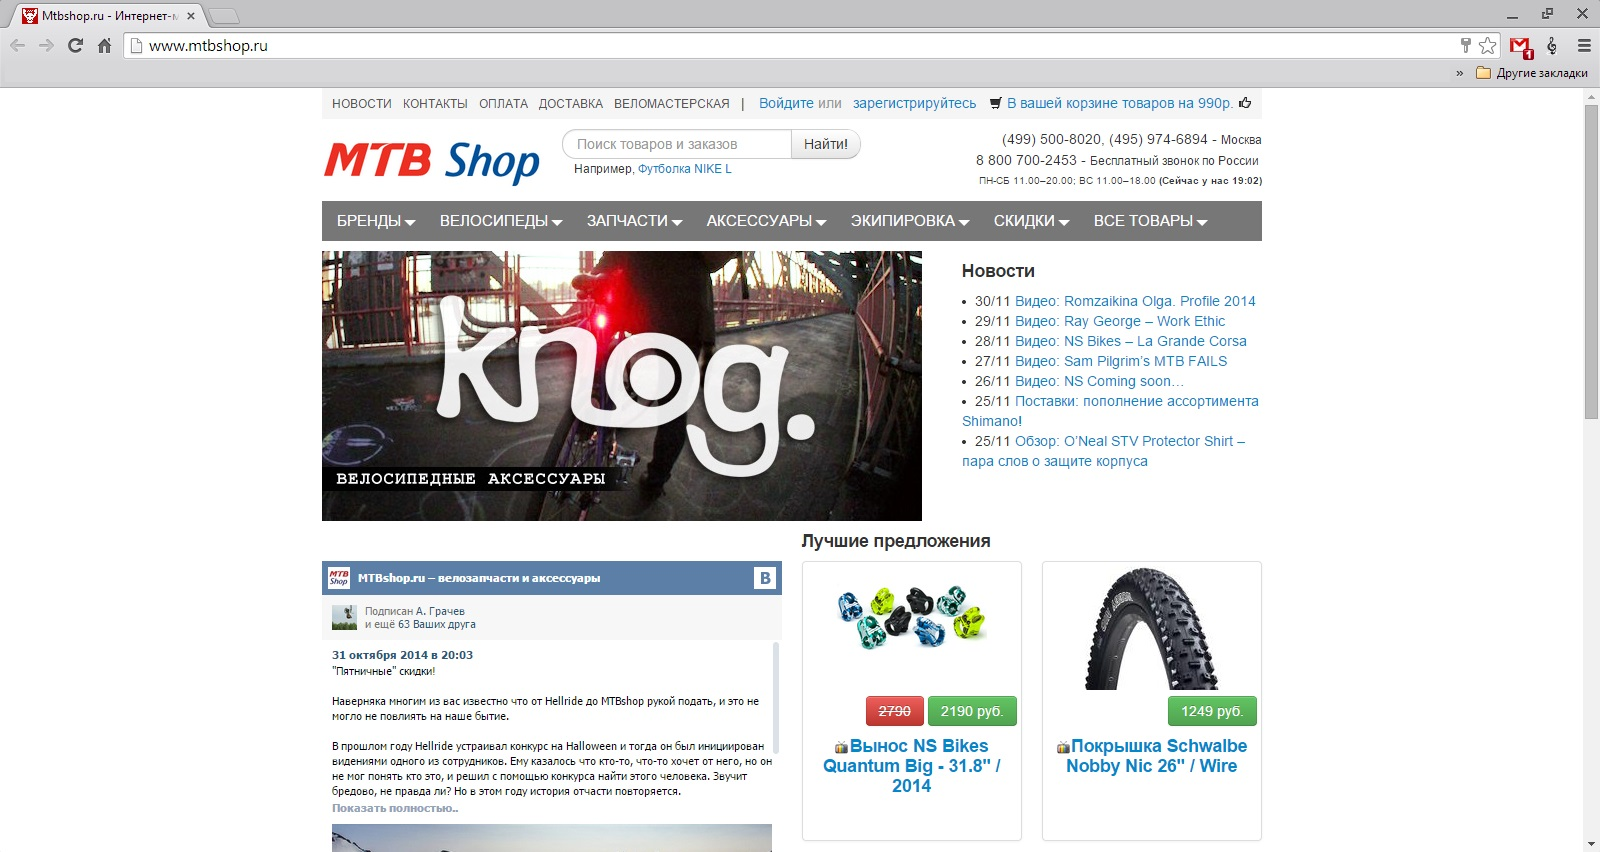 Блог им. AnzorShuhov: Обзор отечественных онлайн магазинов